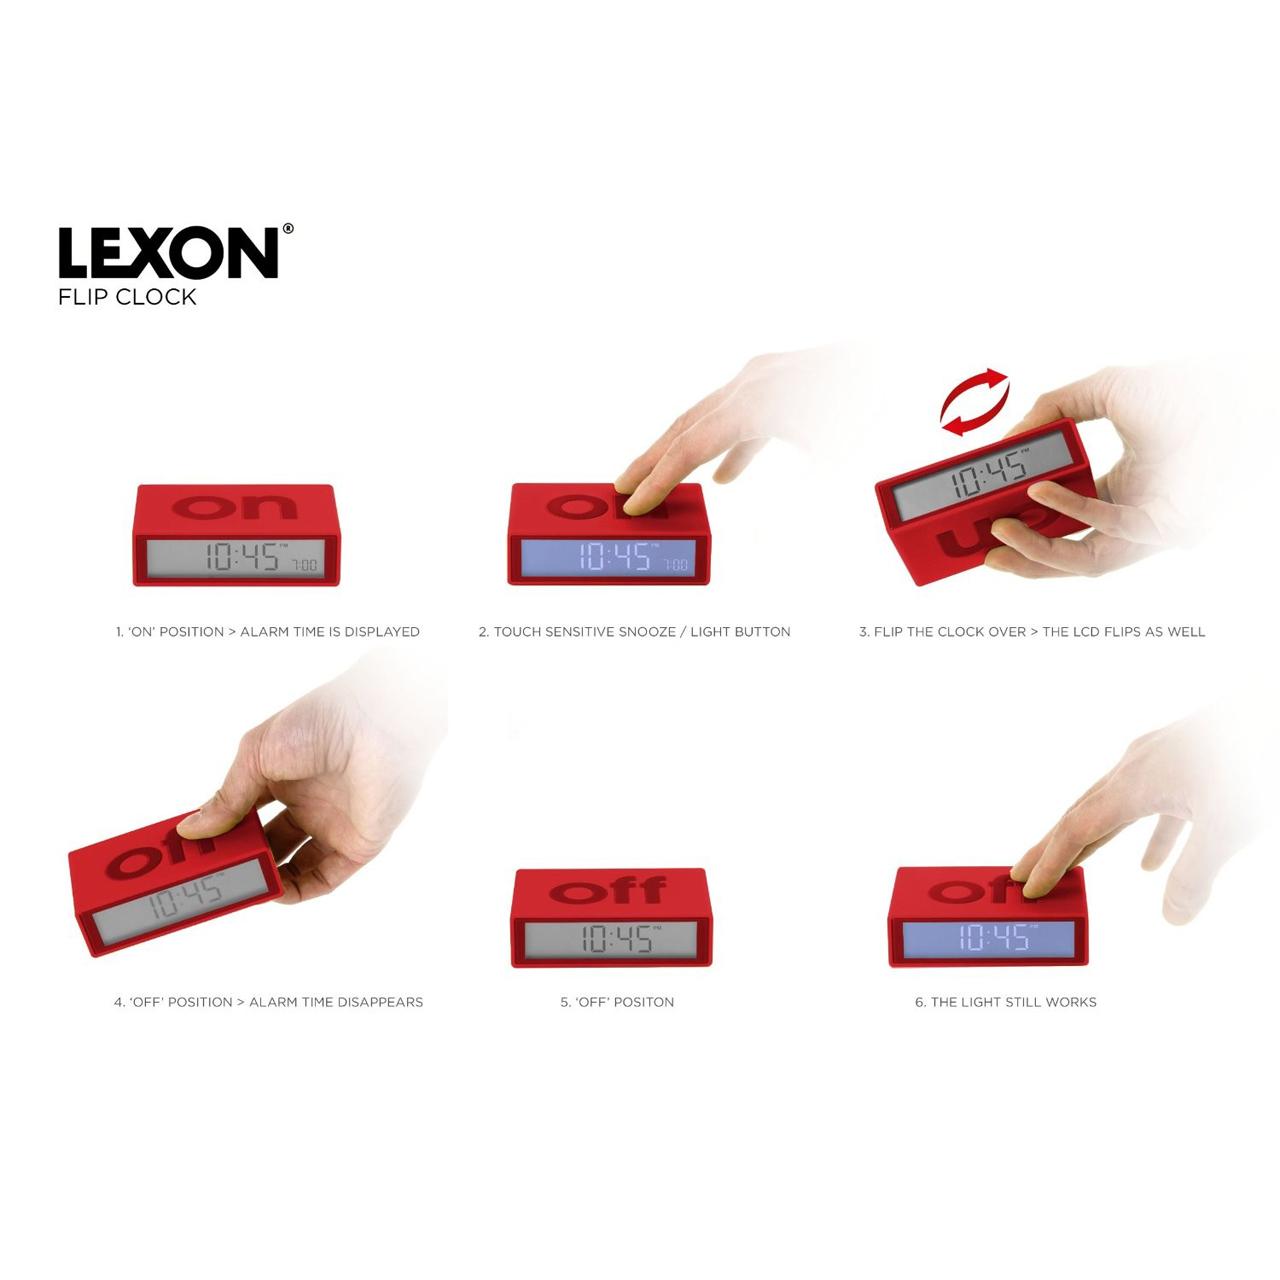 LEXON FLIP alarm clock (visual function description)